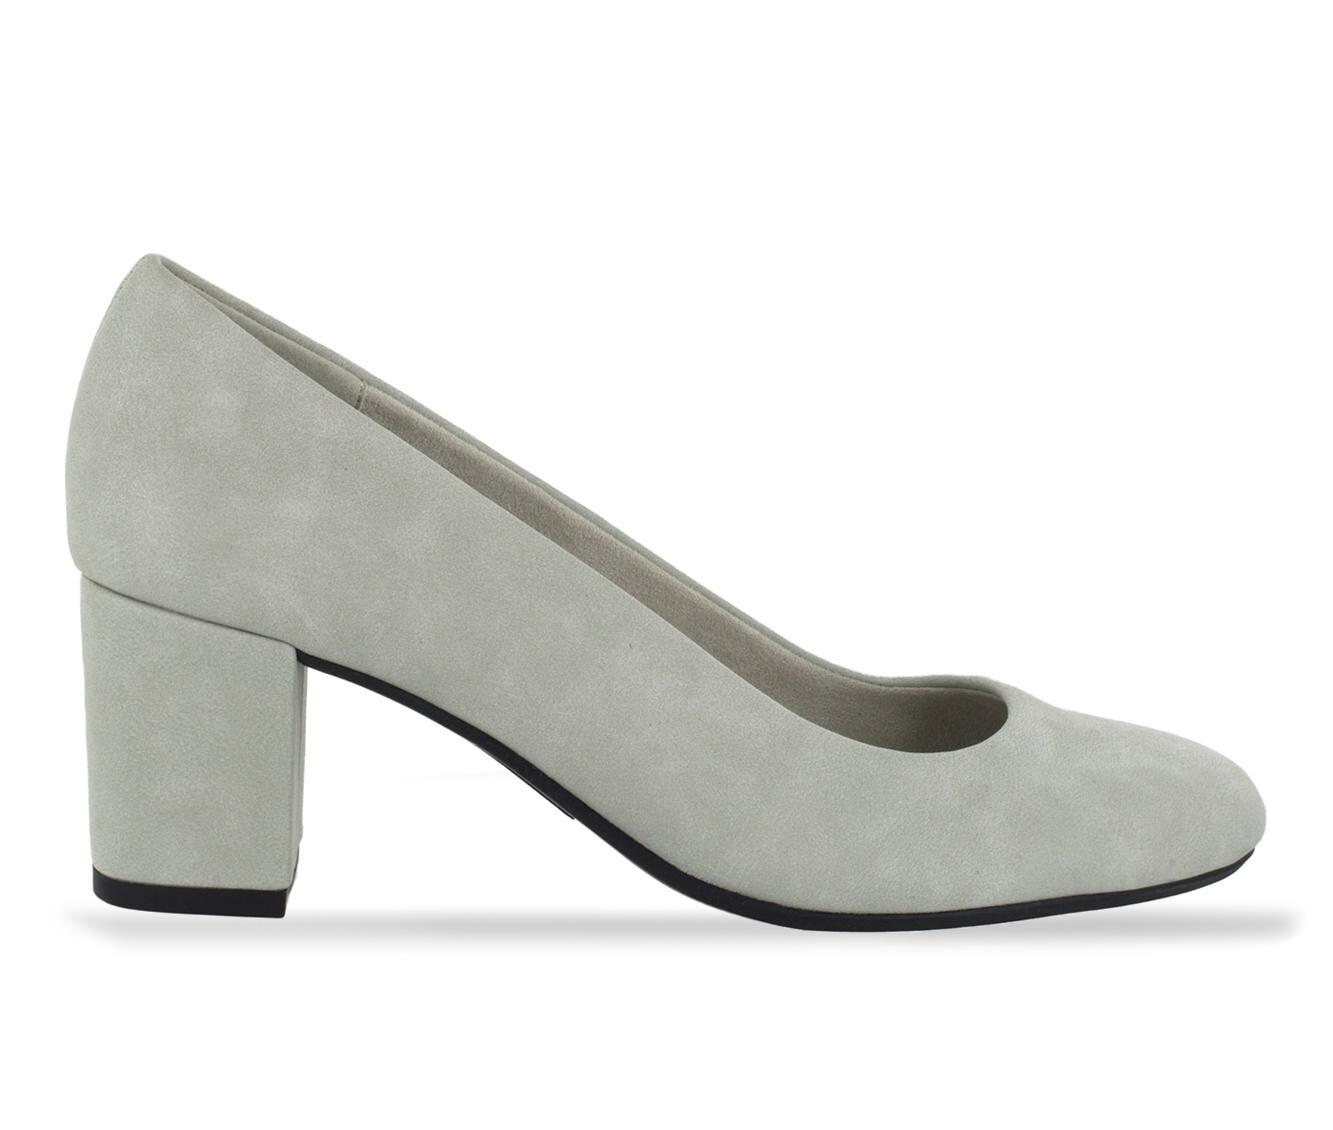 uk shoes_kd6467